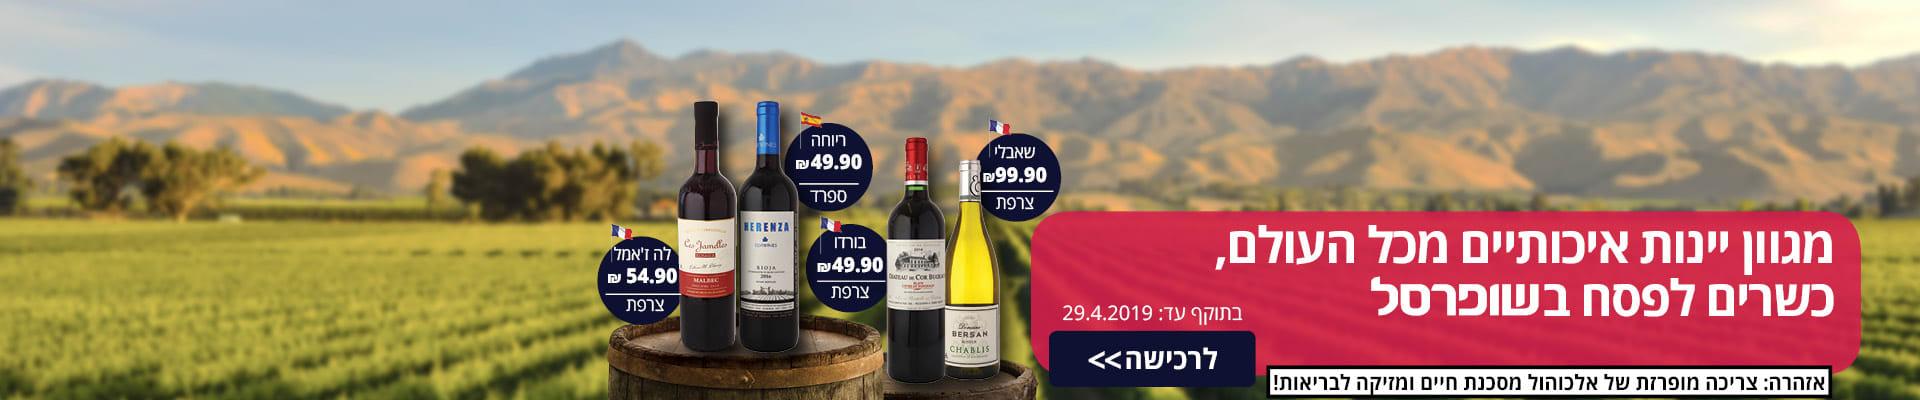 wine-1920-400-2.jpg